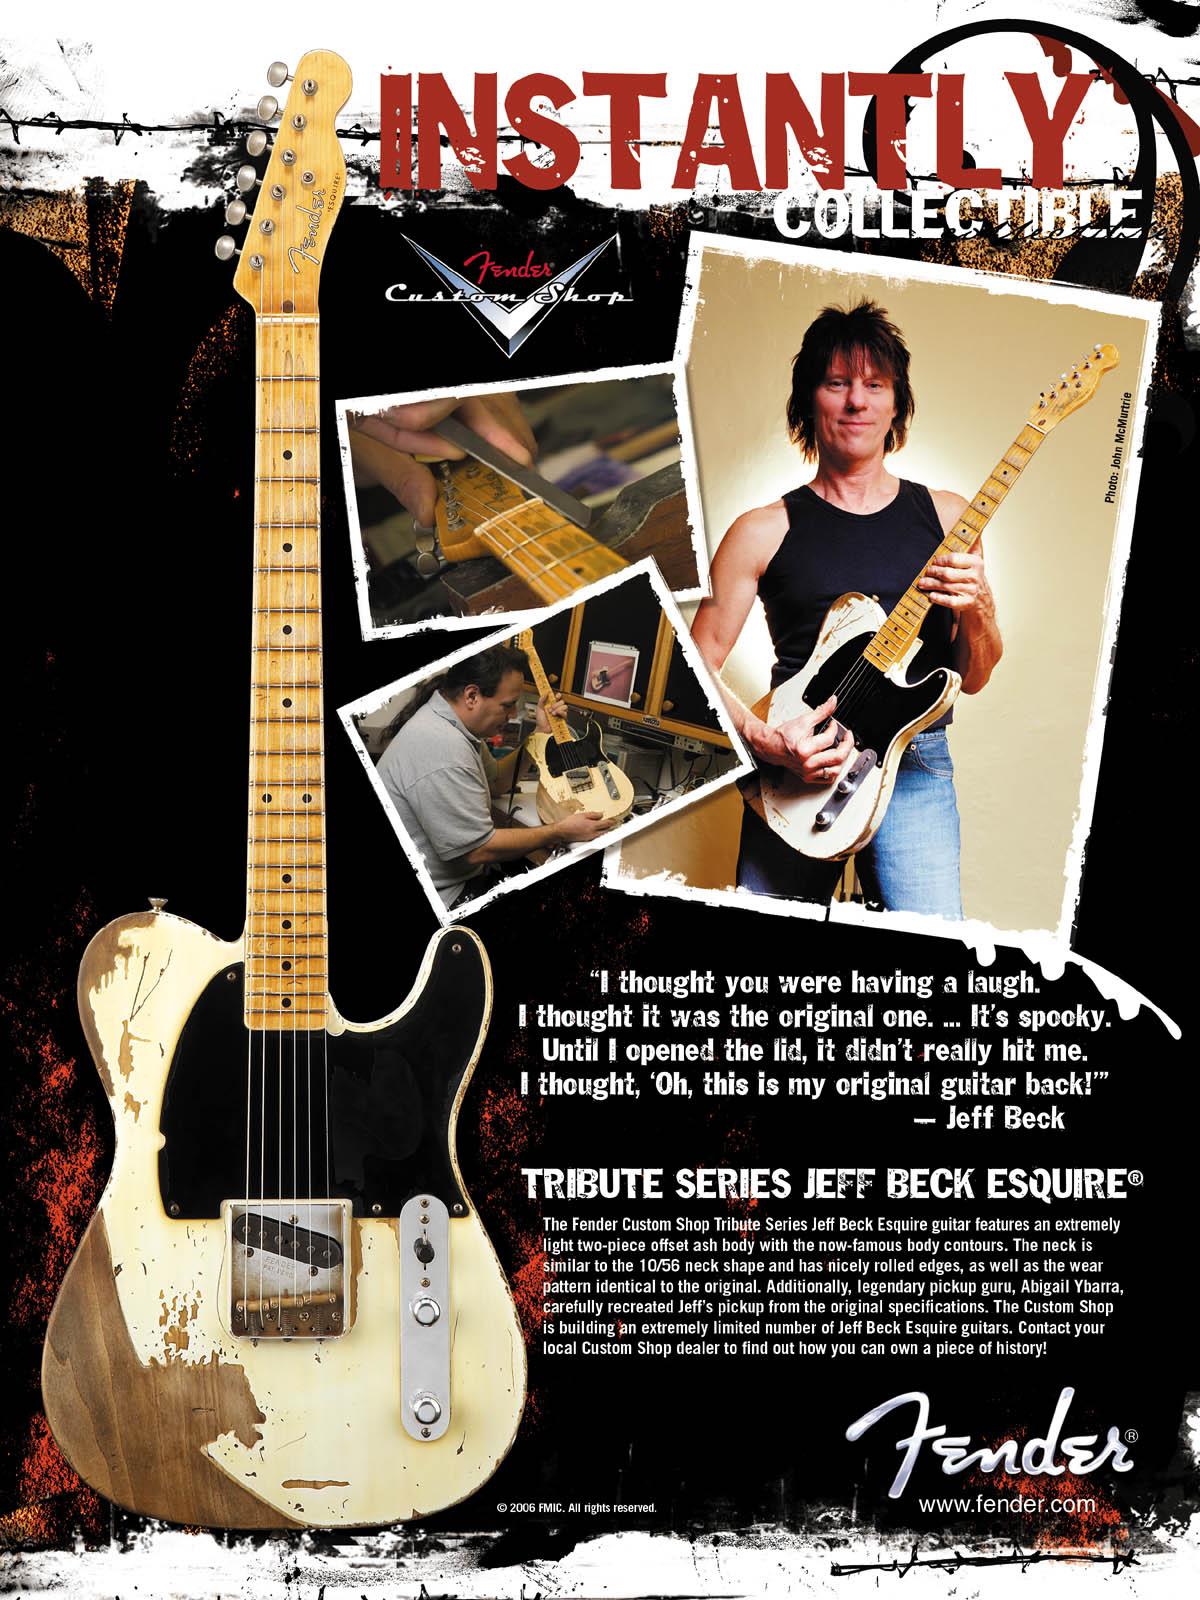 Guitar Snob: Jeff Beck\'s Birthday - Happy Birthday Guvnor!